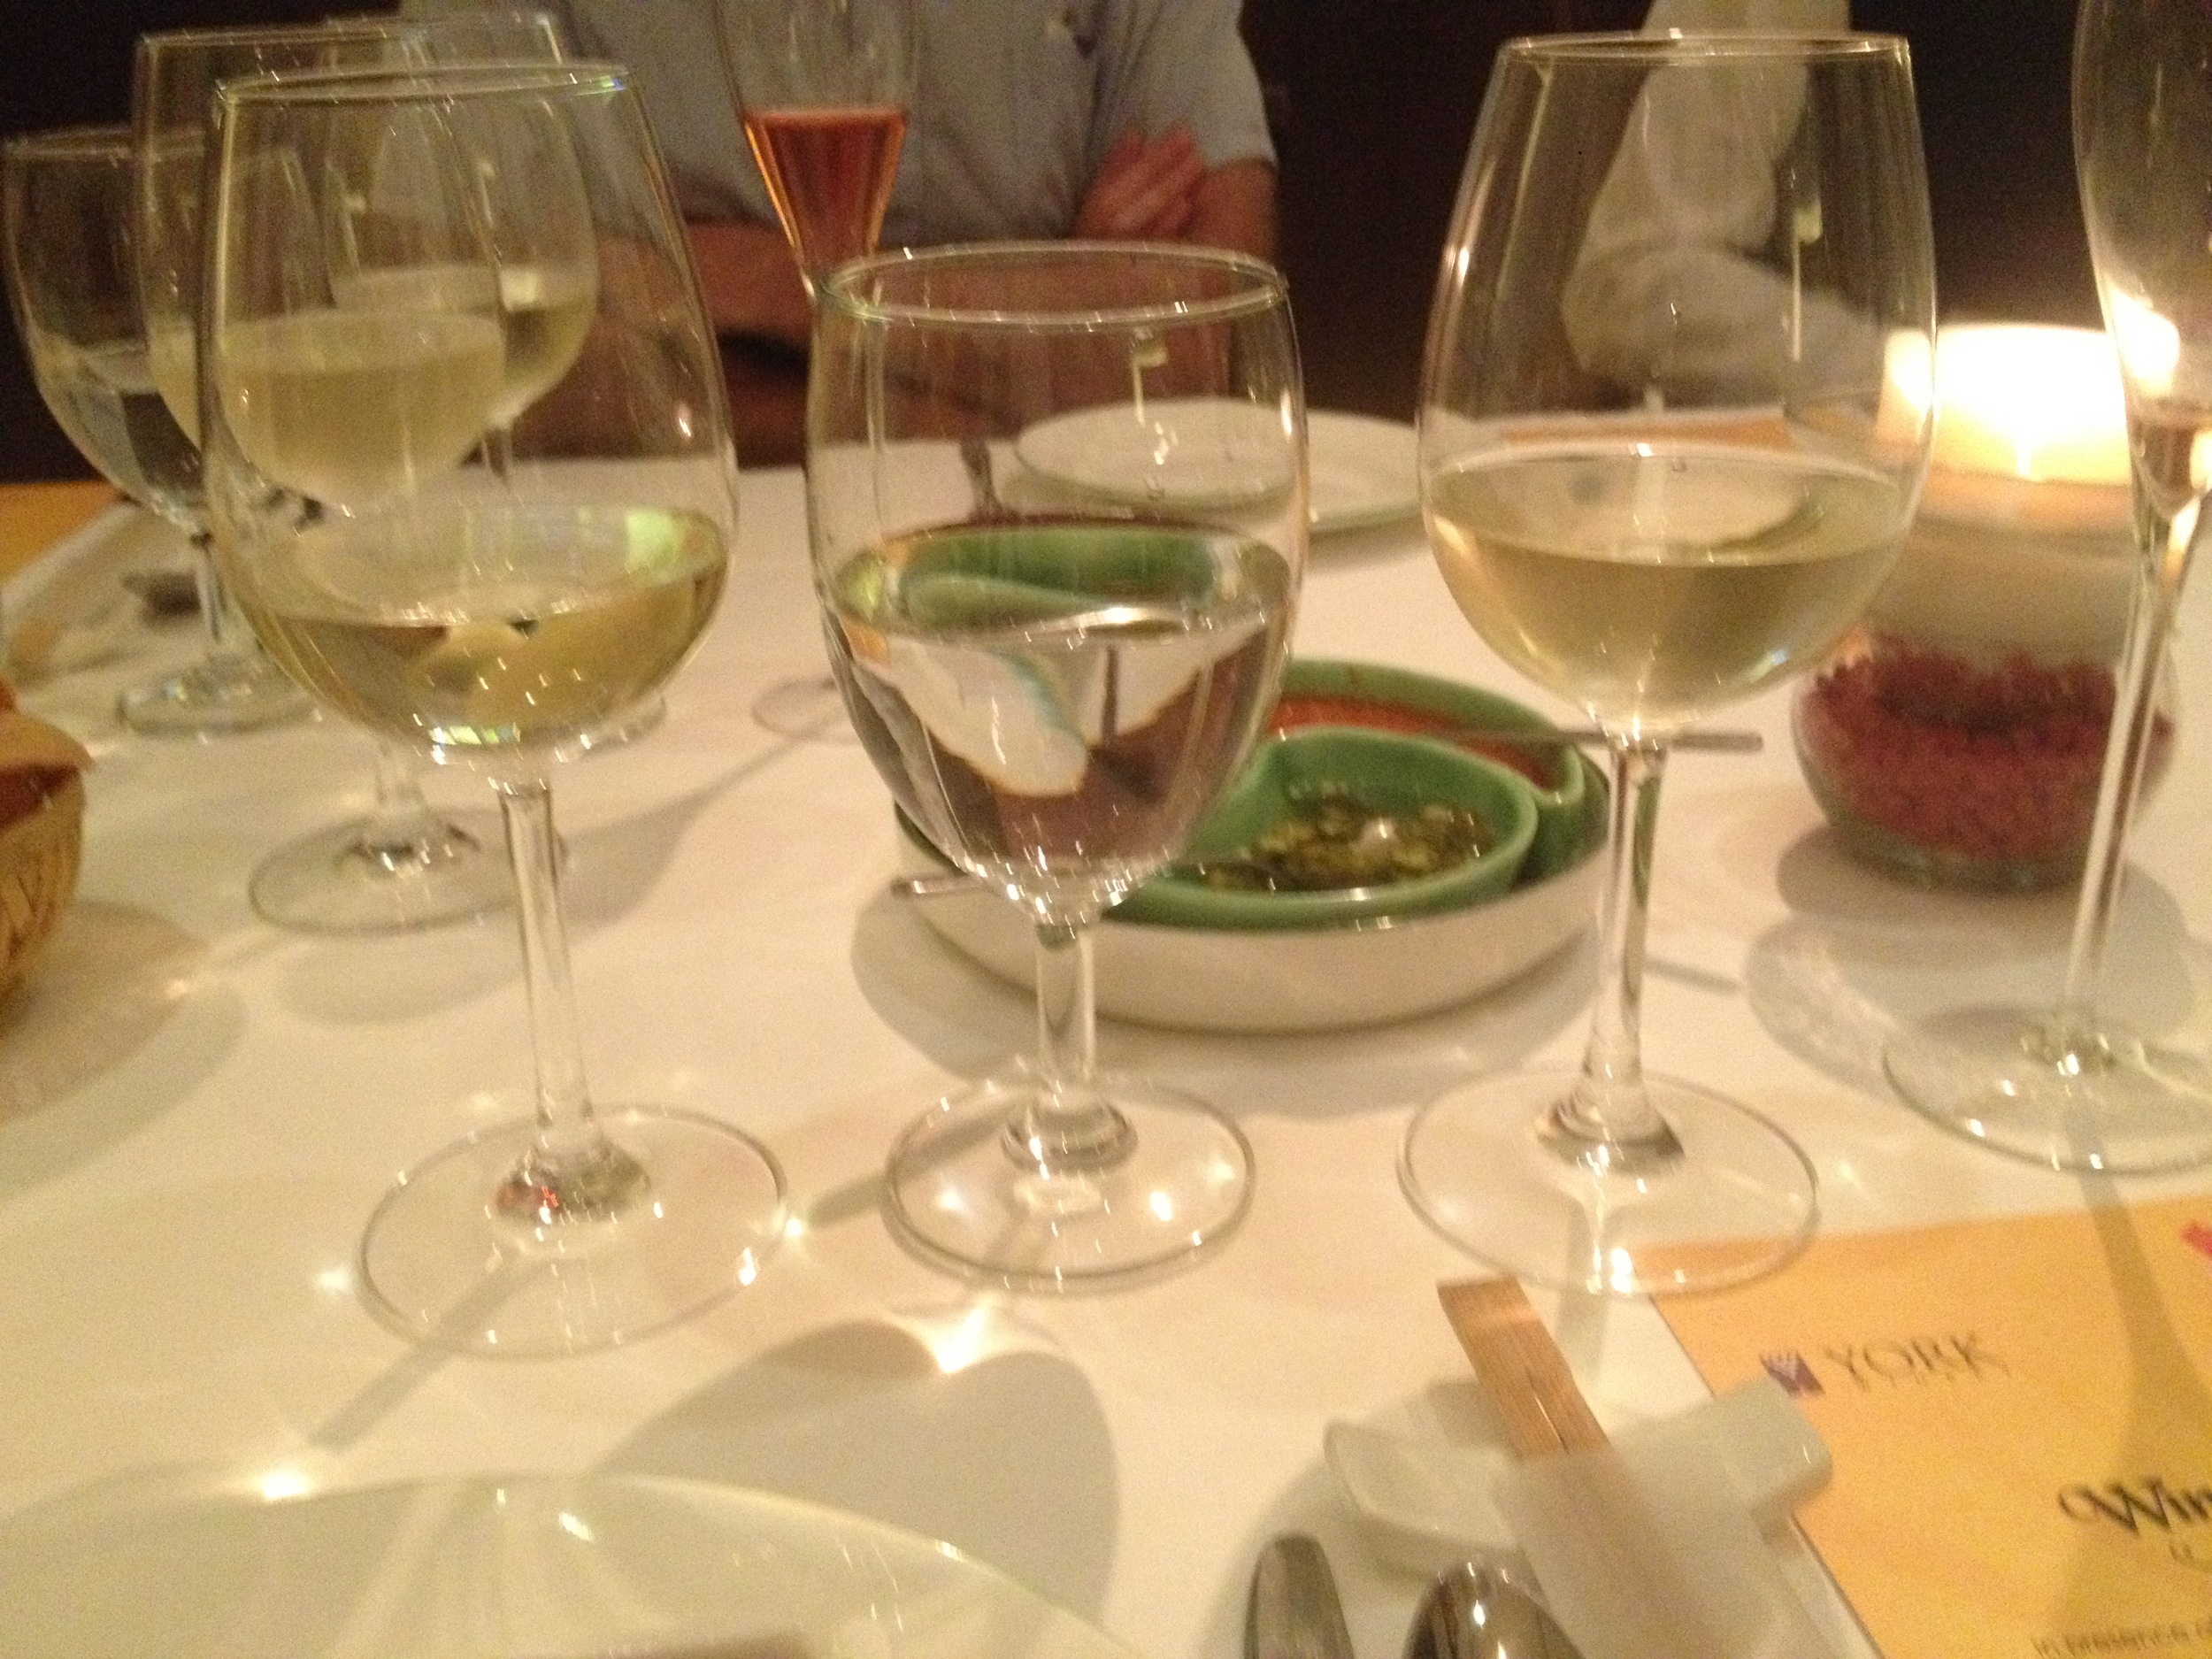 York Sauvignon Blanc and York Chenin Blanc